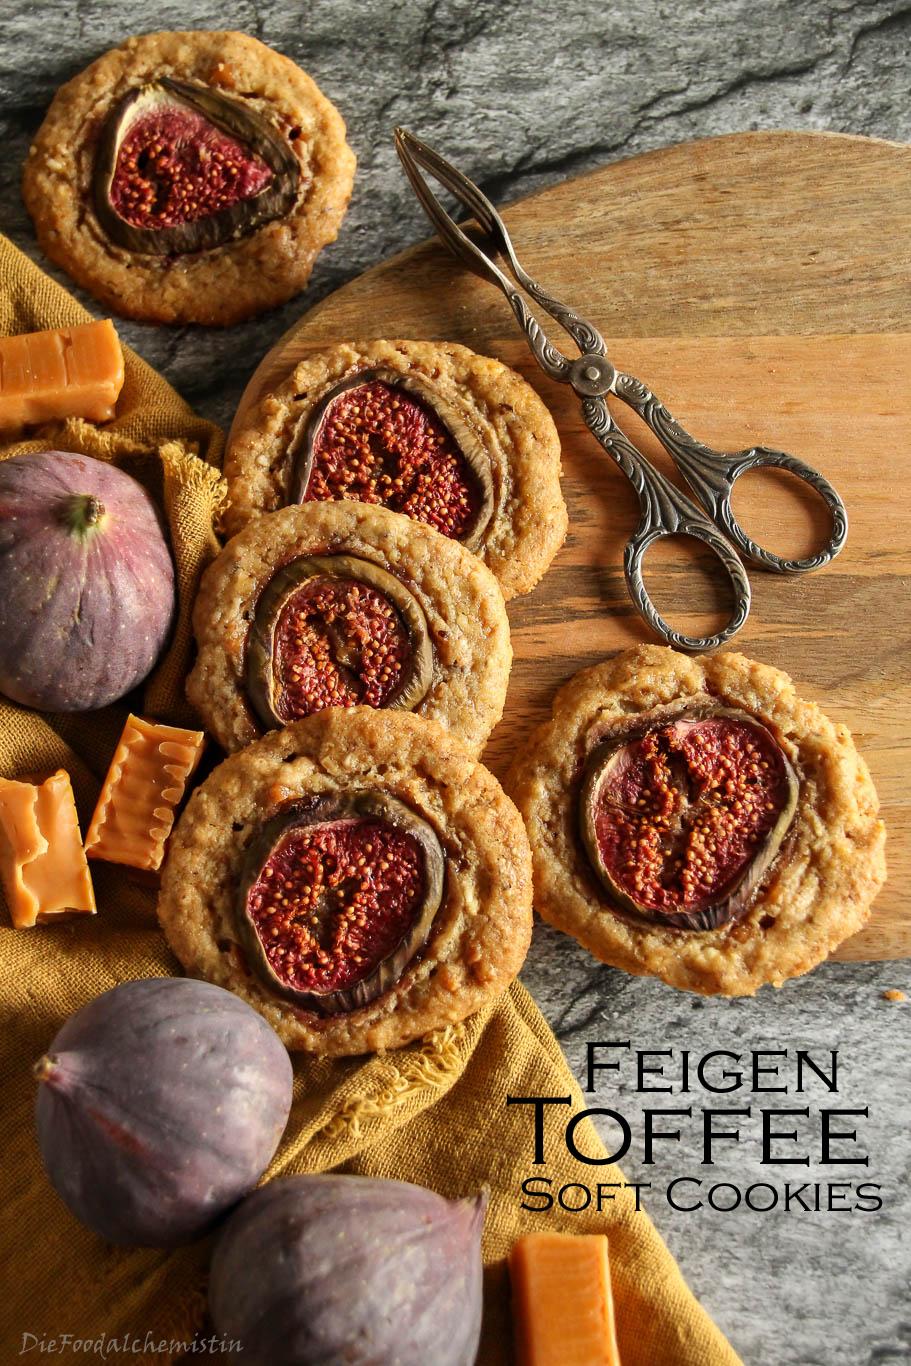 Feigen-Toffee-Soft-Cookies4